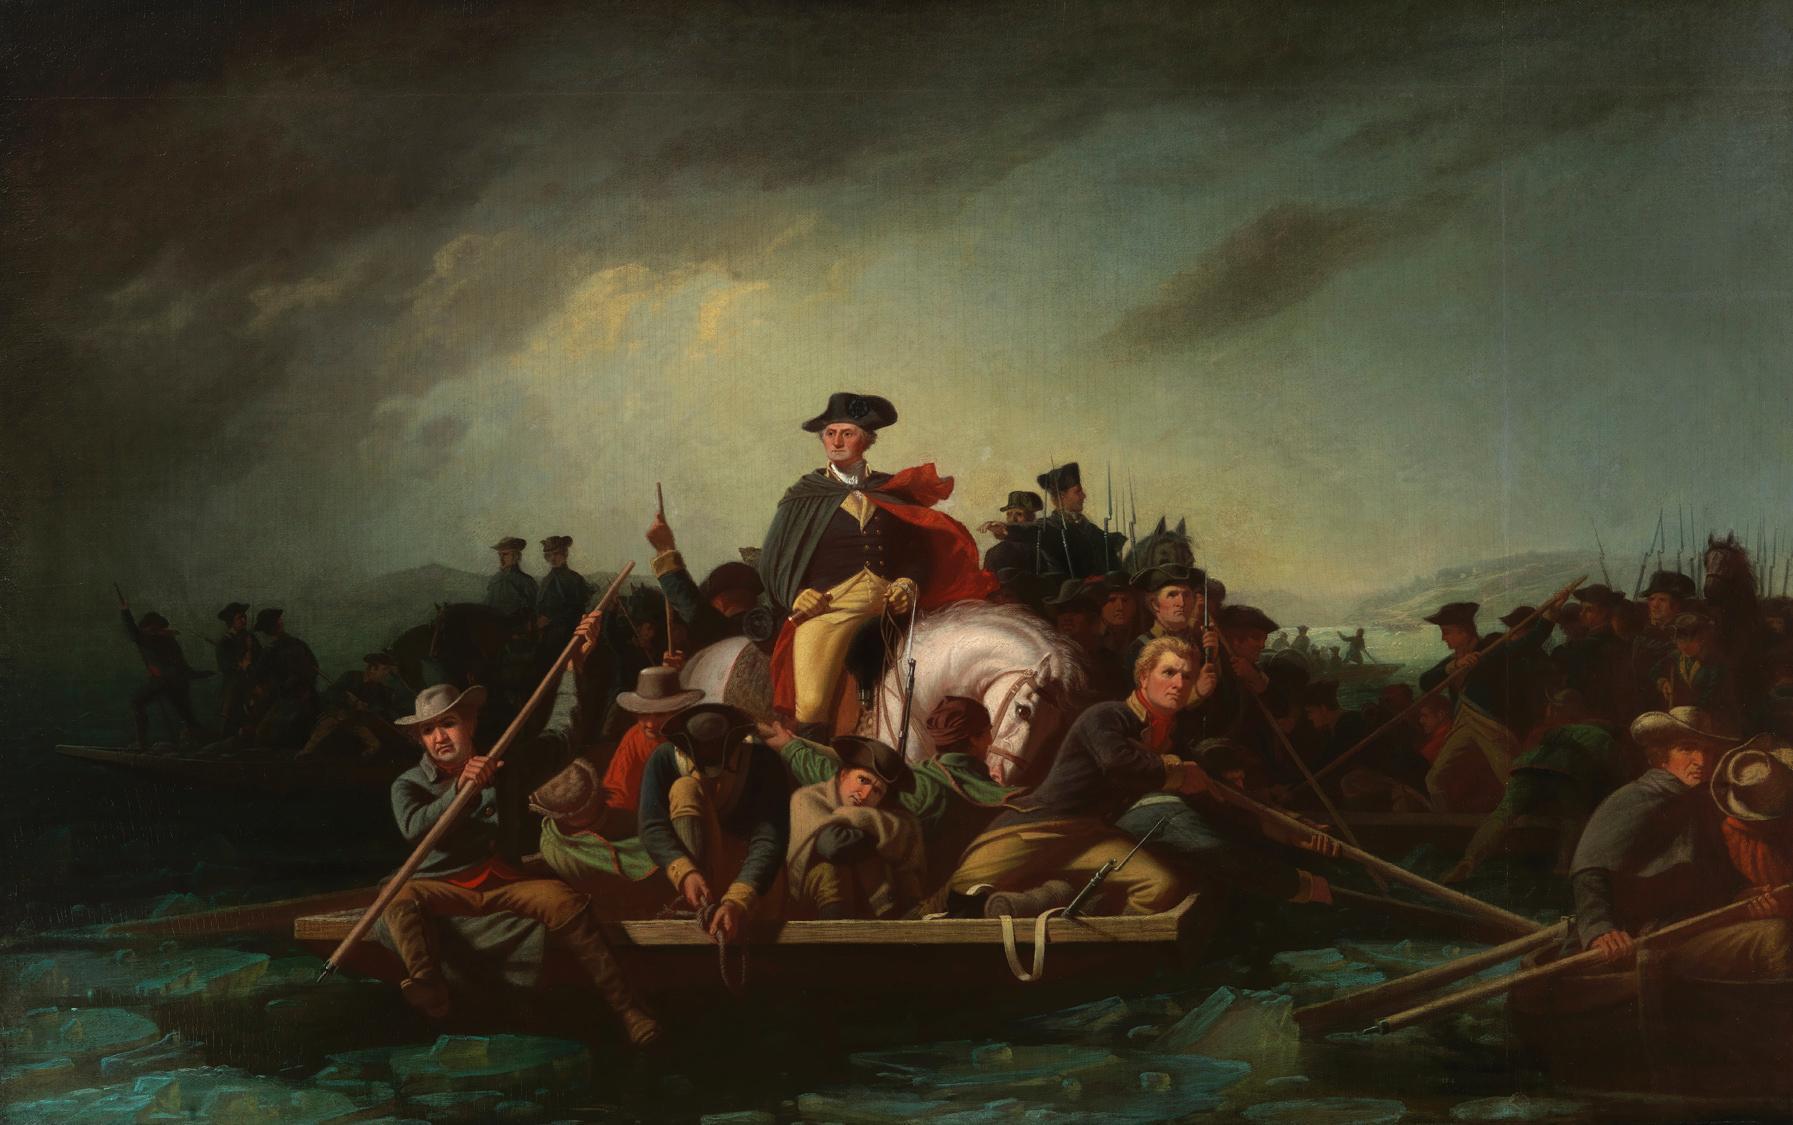 Washington_Crossing_the_Delaware_1856-71_George_Caleb_Bingham.jpg